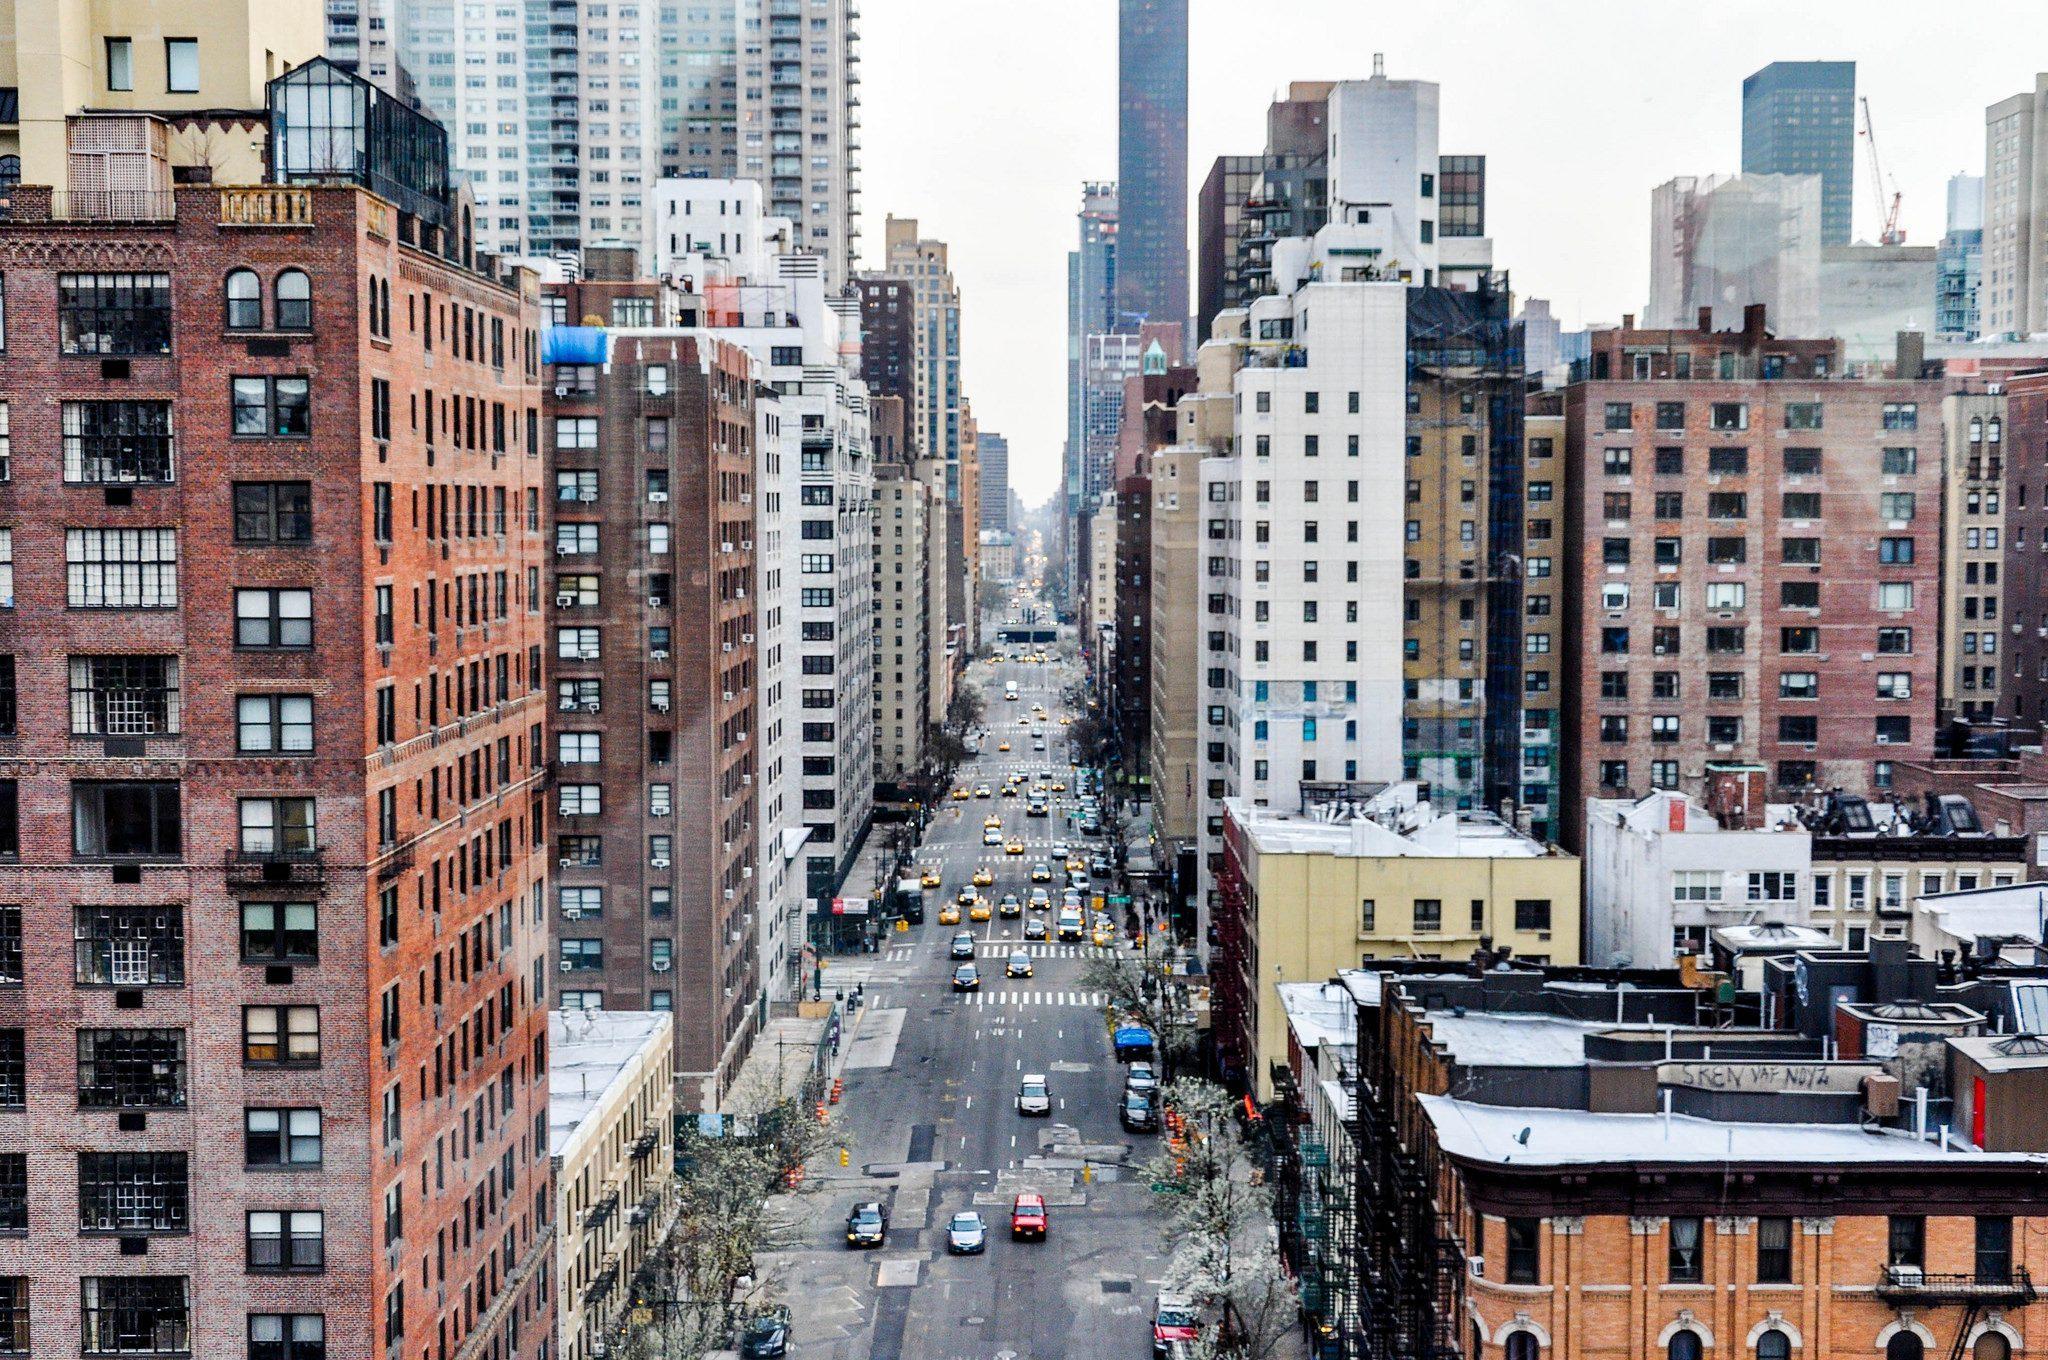 1st Avenue New York